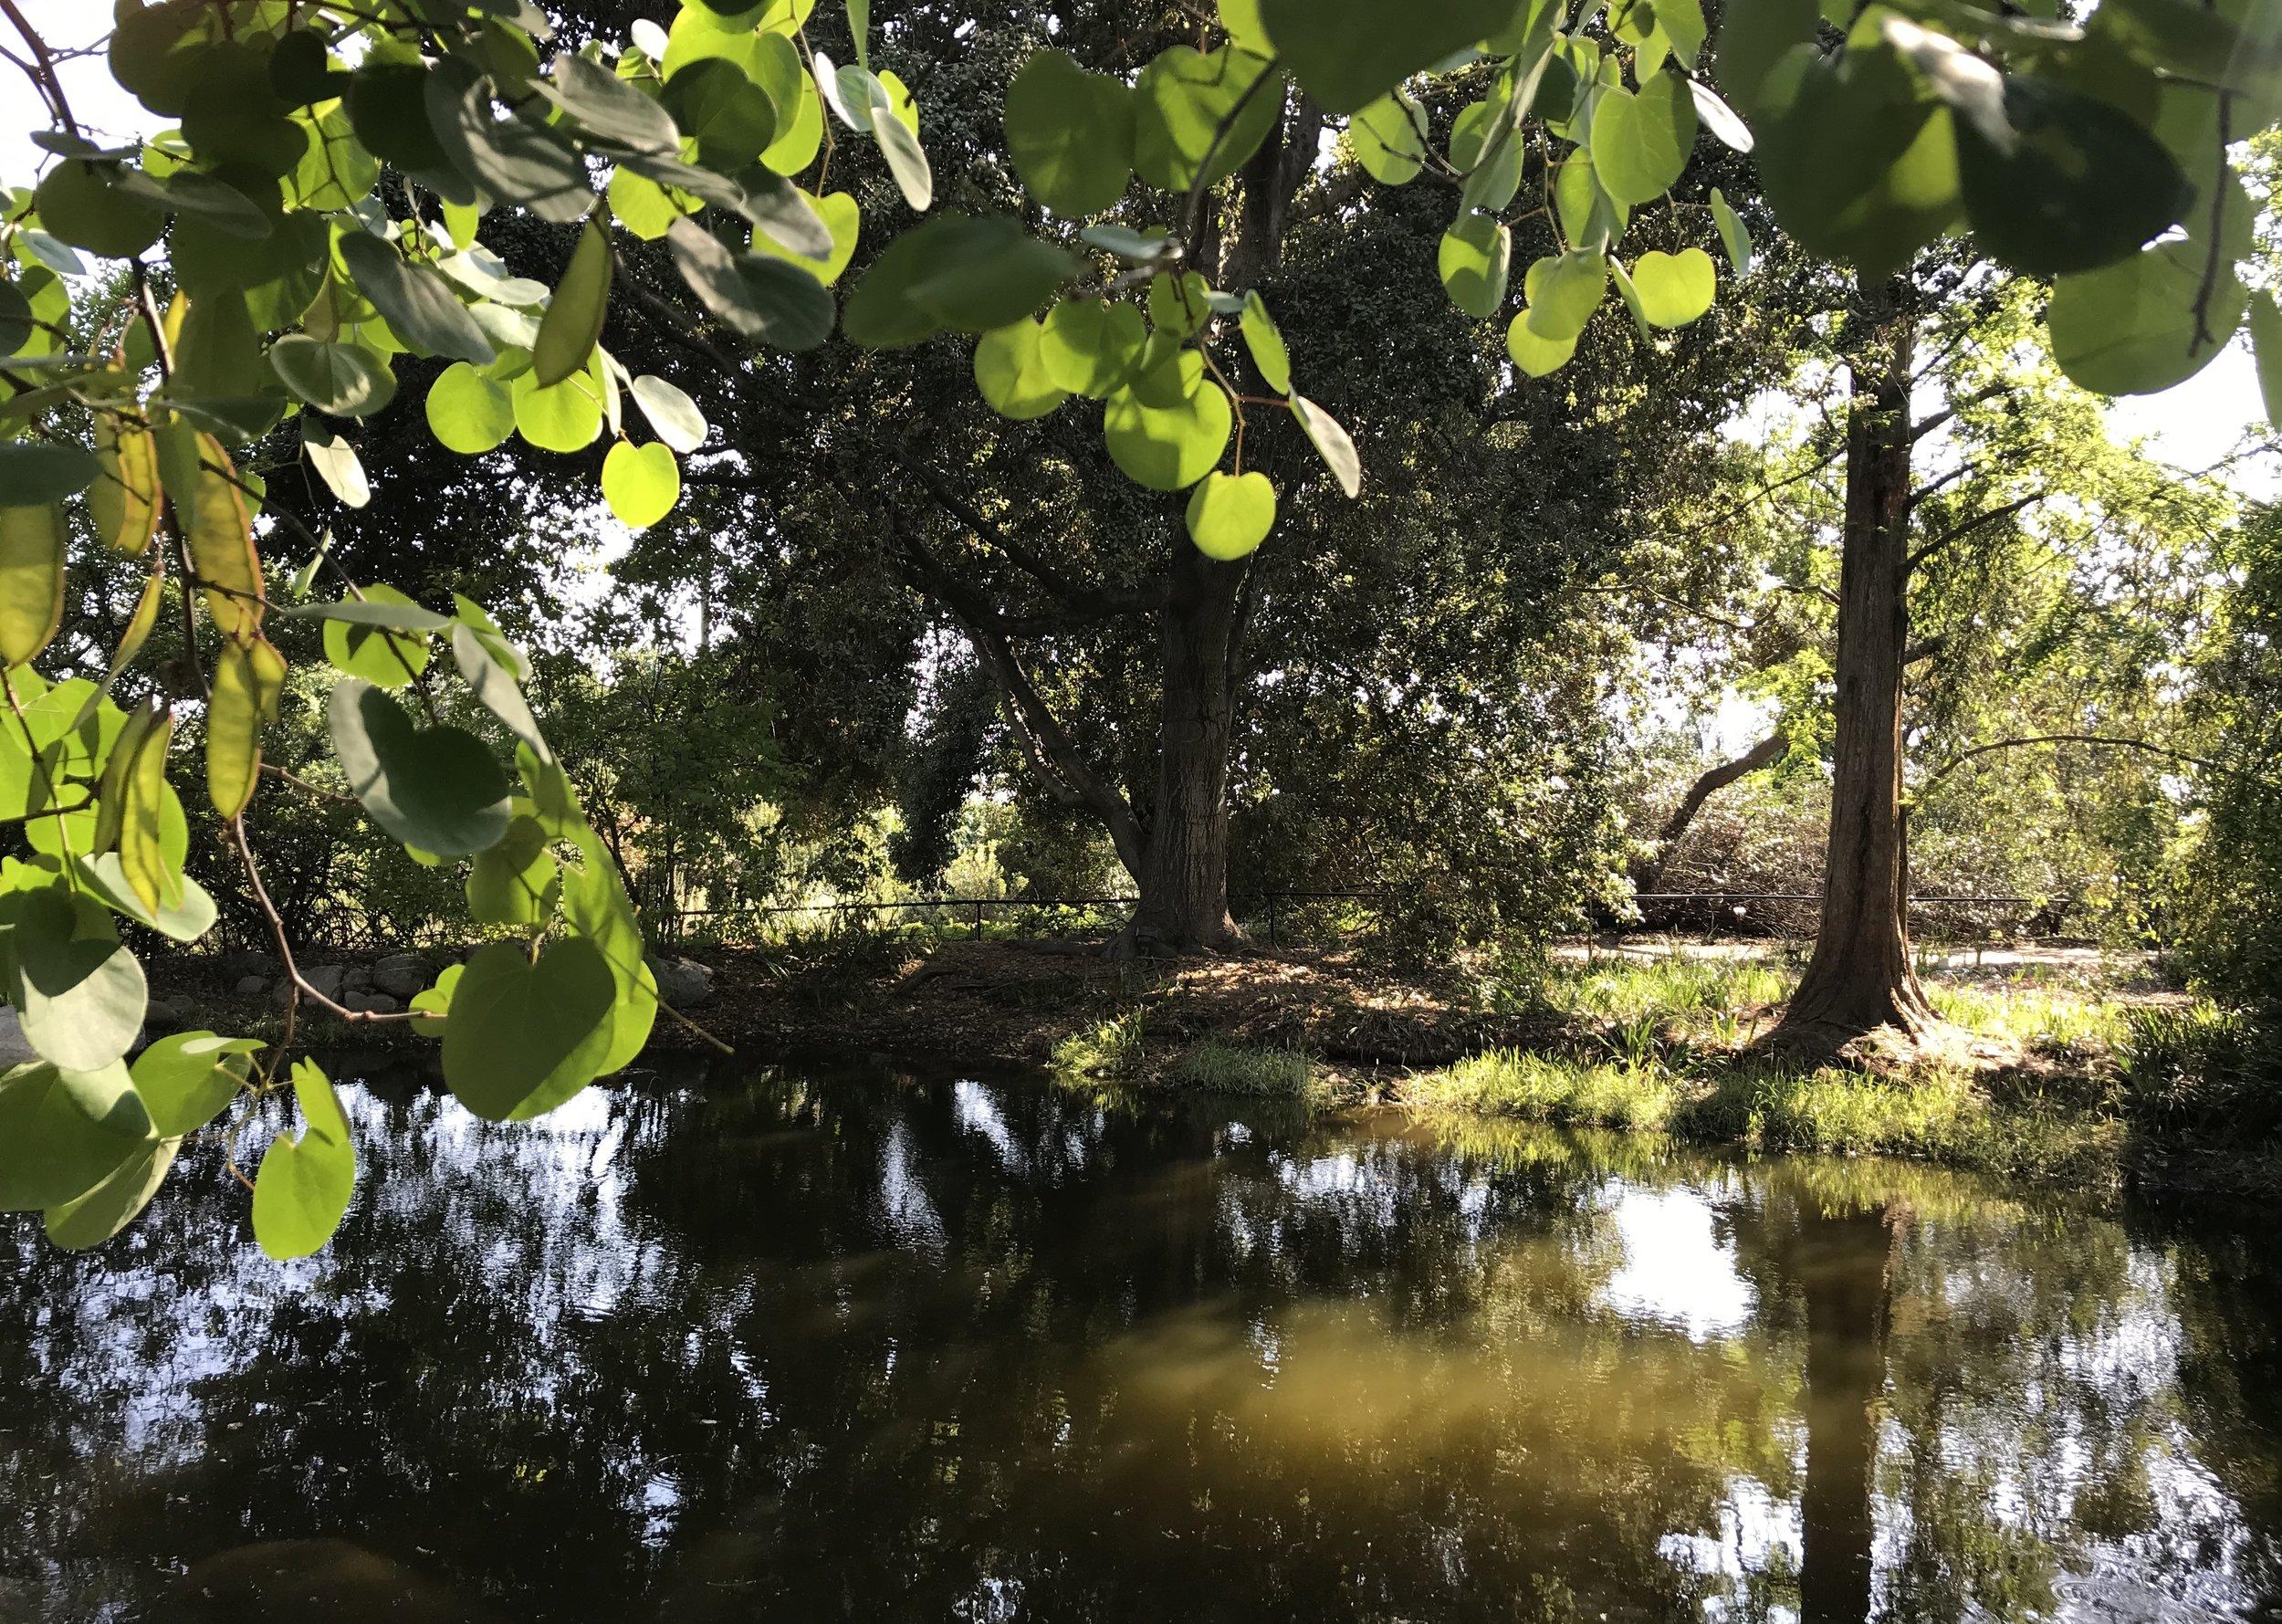 A pond inside the botanic garden.